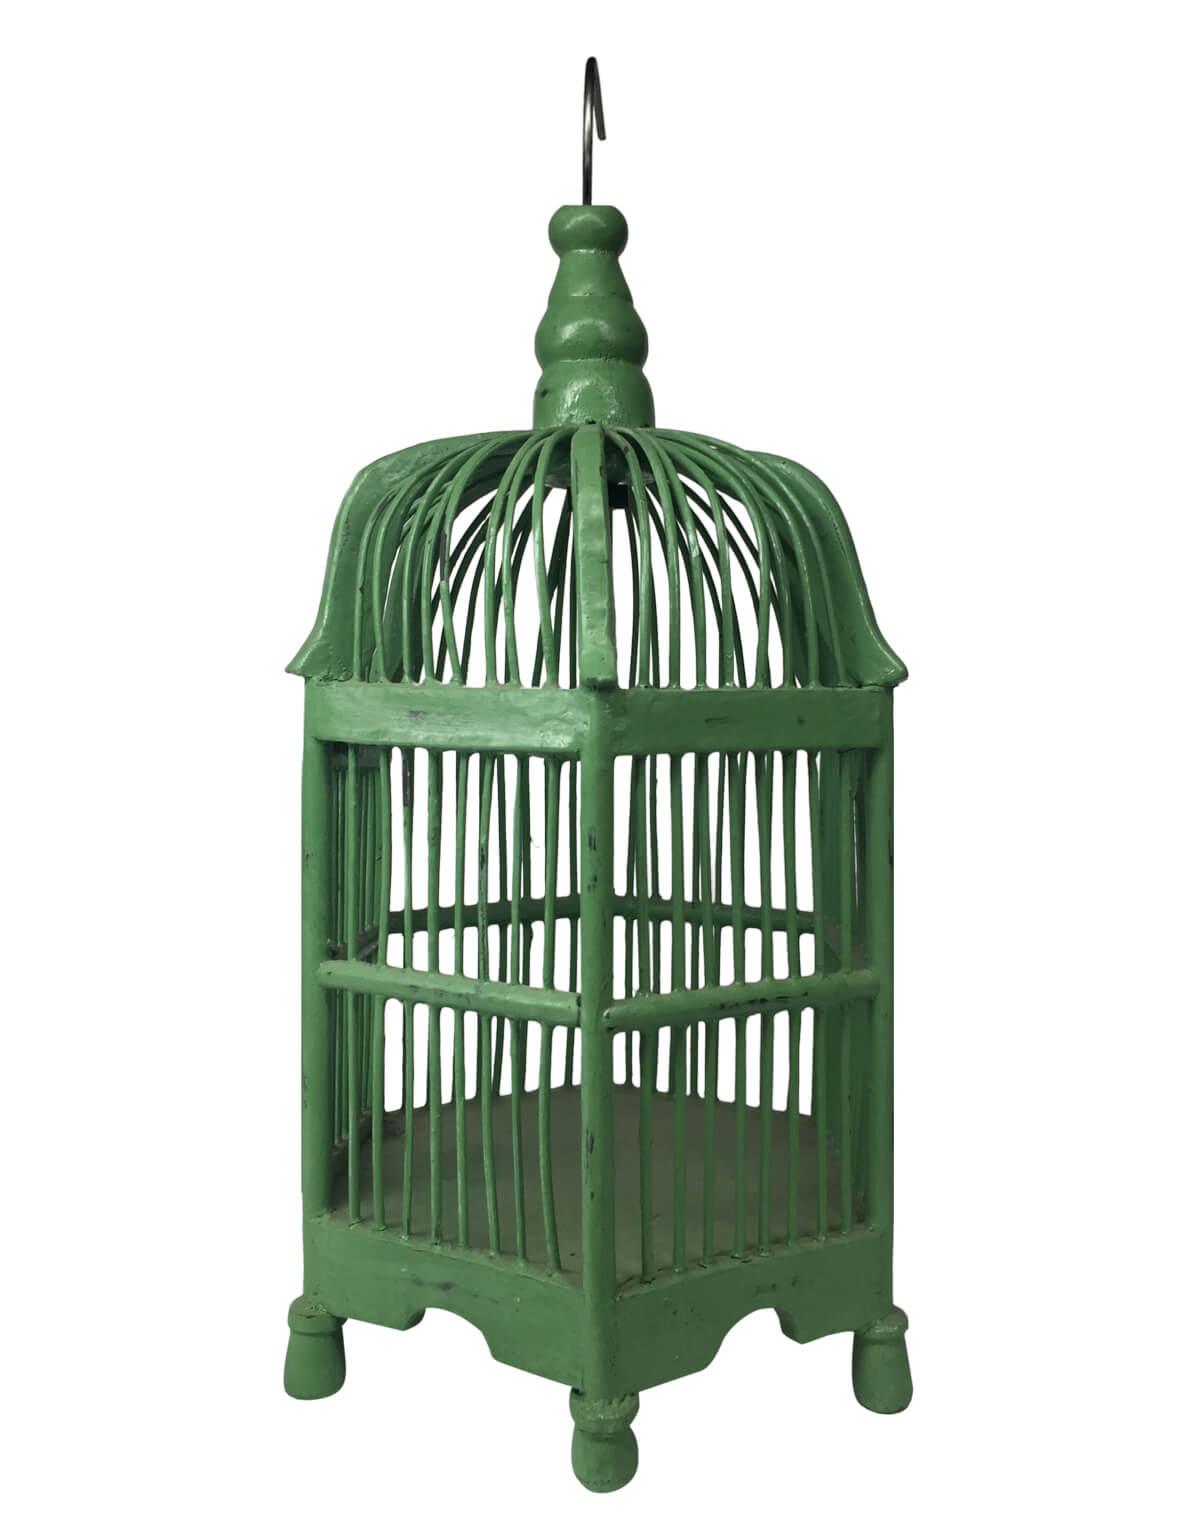 клетка для птиц из дерева